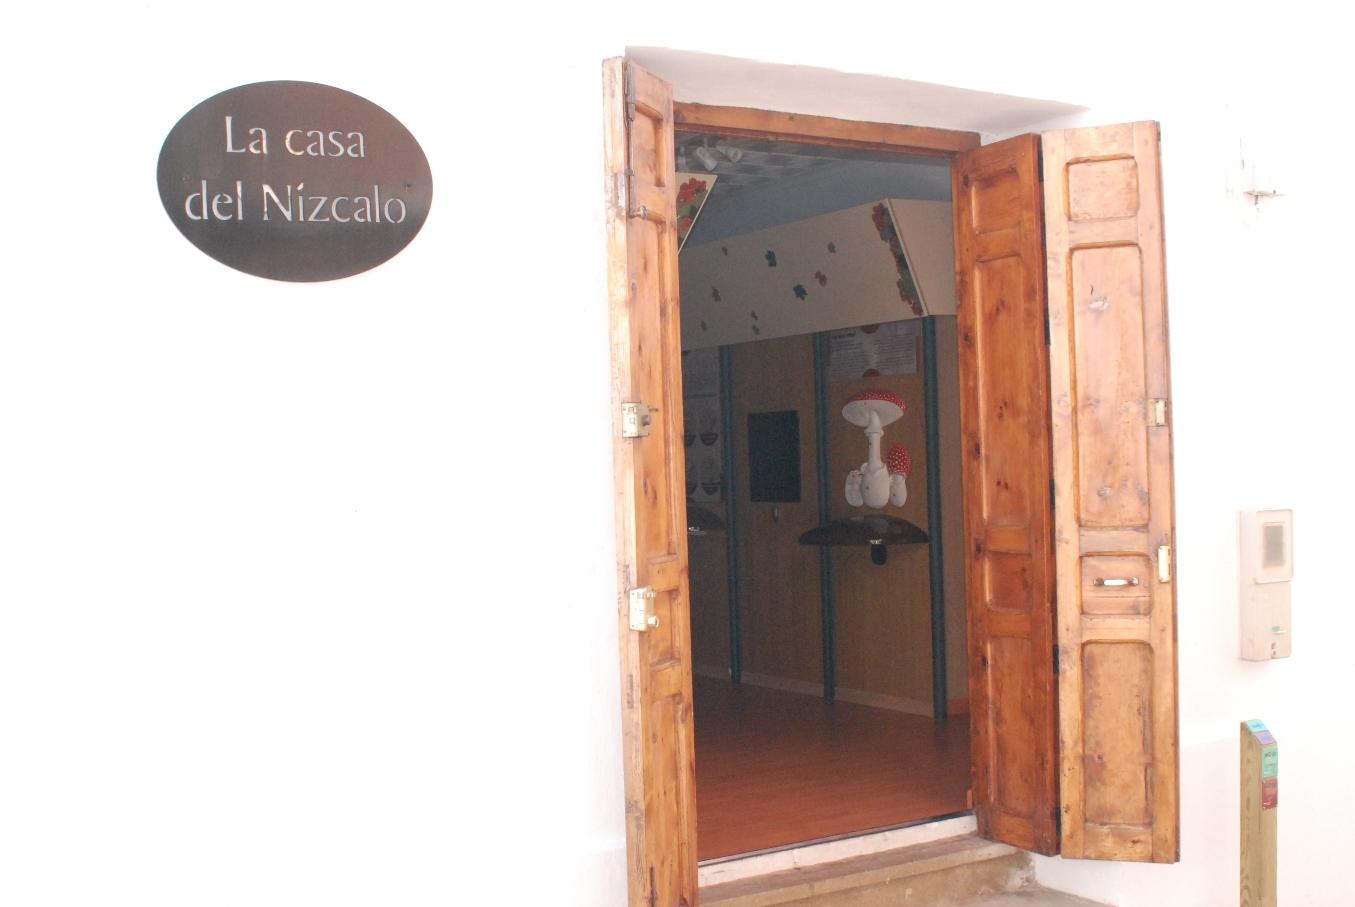 Museo del niscalo. Molinicos.  niscalo